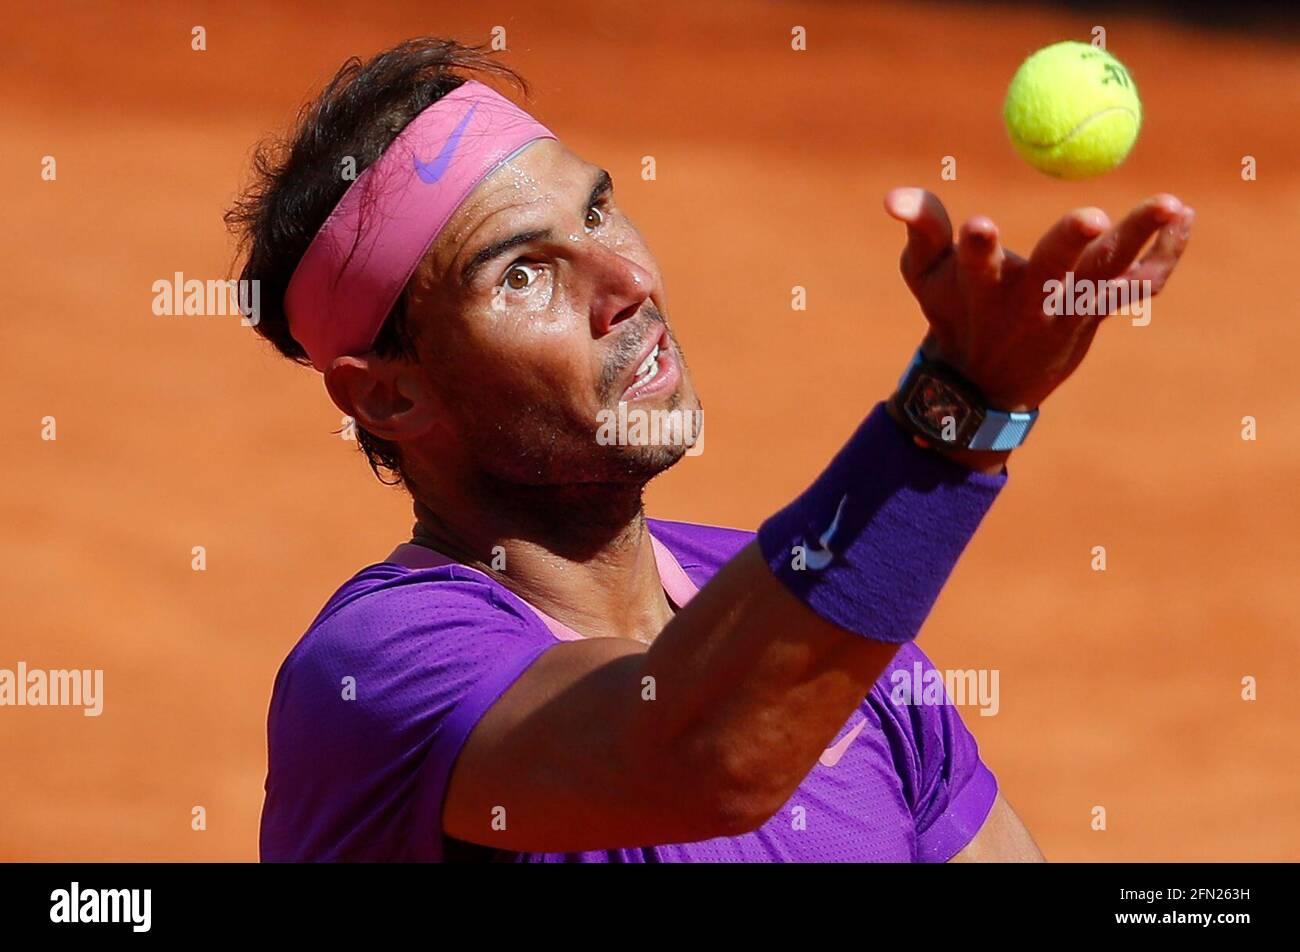 Tennis - ATP Masters 1000 - Italian Open - Foro Italico, Rom, Italien - 13. Mai 2021 der Spanier Rafael Nadal war in seinem dritten Spiel gegen den Kanadier Denis Shapovalov REUTERS/Guglielmo Mangiapane in Aktion Stockfoto